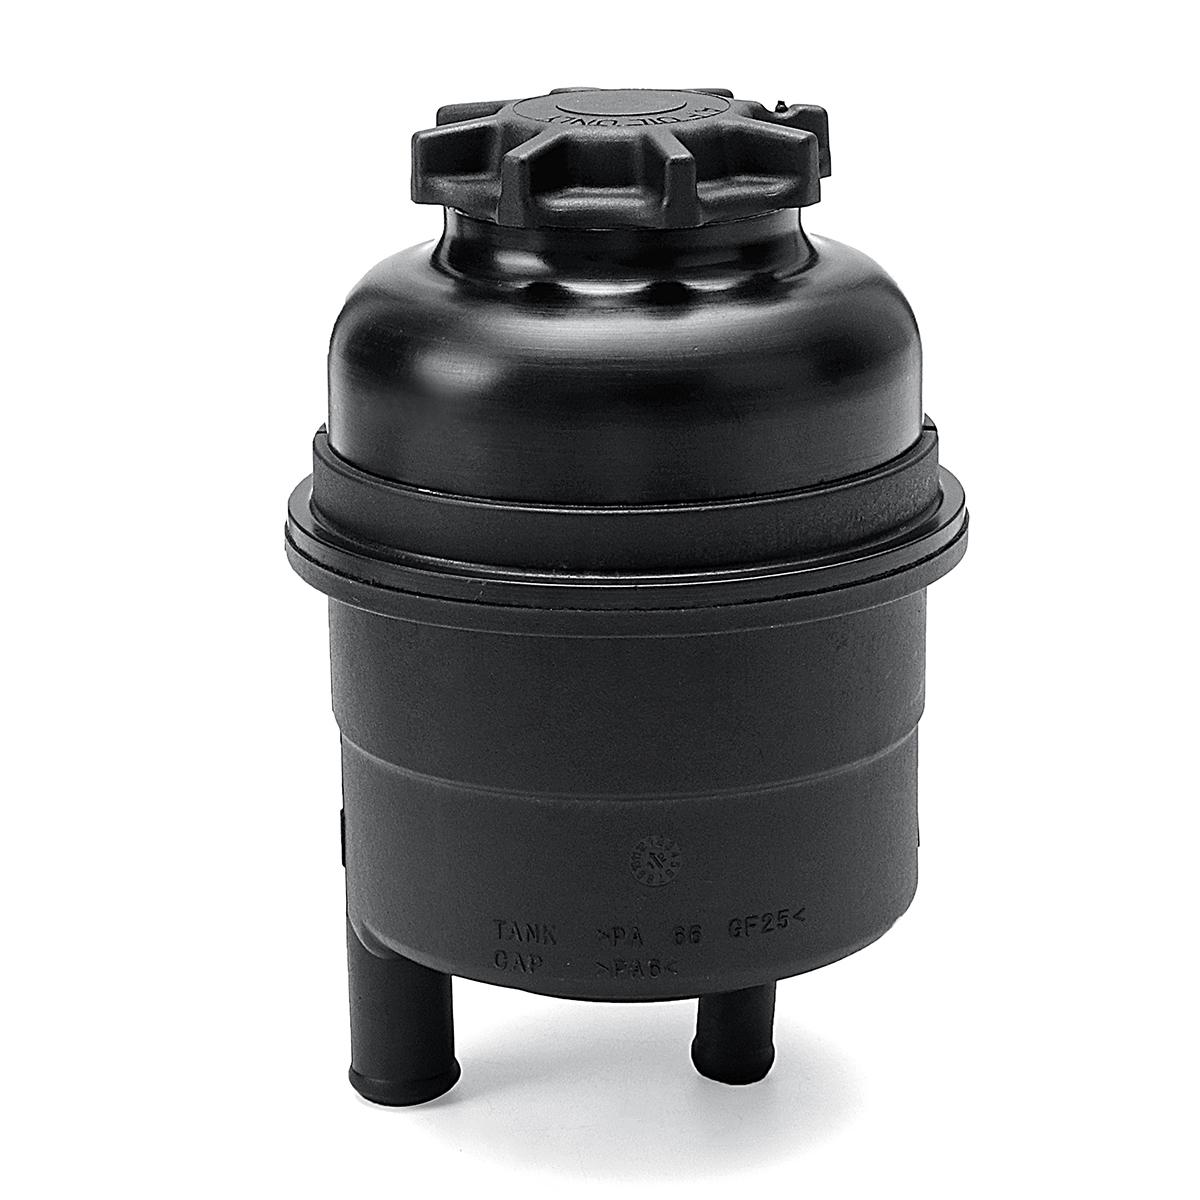 Power Steering Pump Reservoir Bottle /& Hose Kit For BMW E39 525i 528i 530i